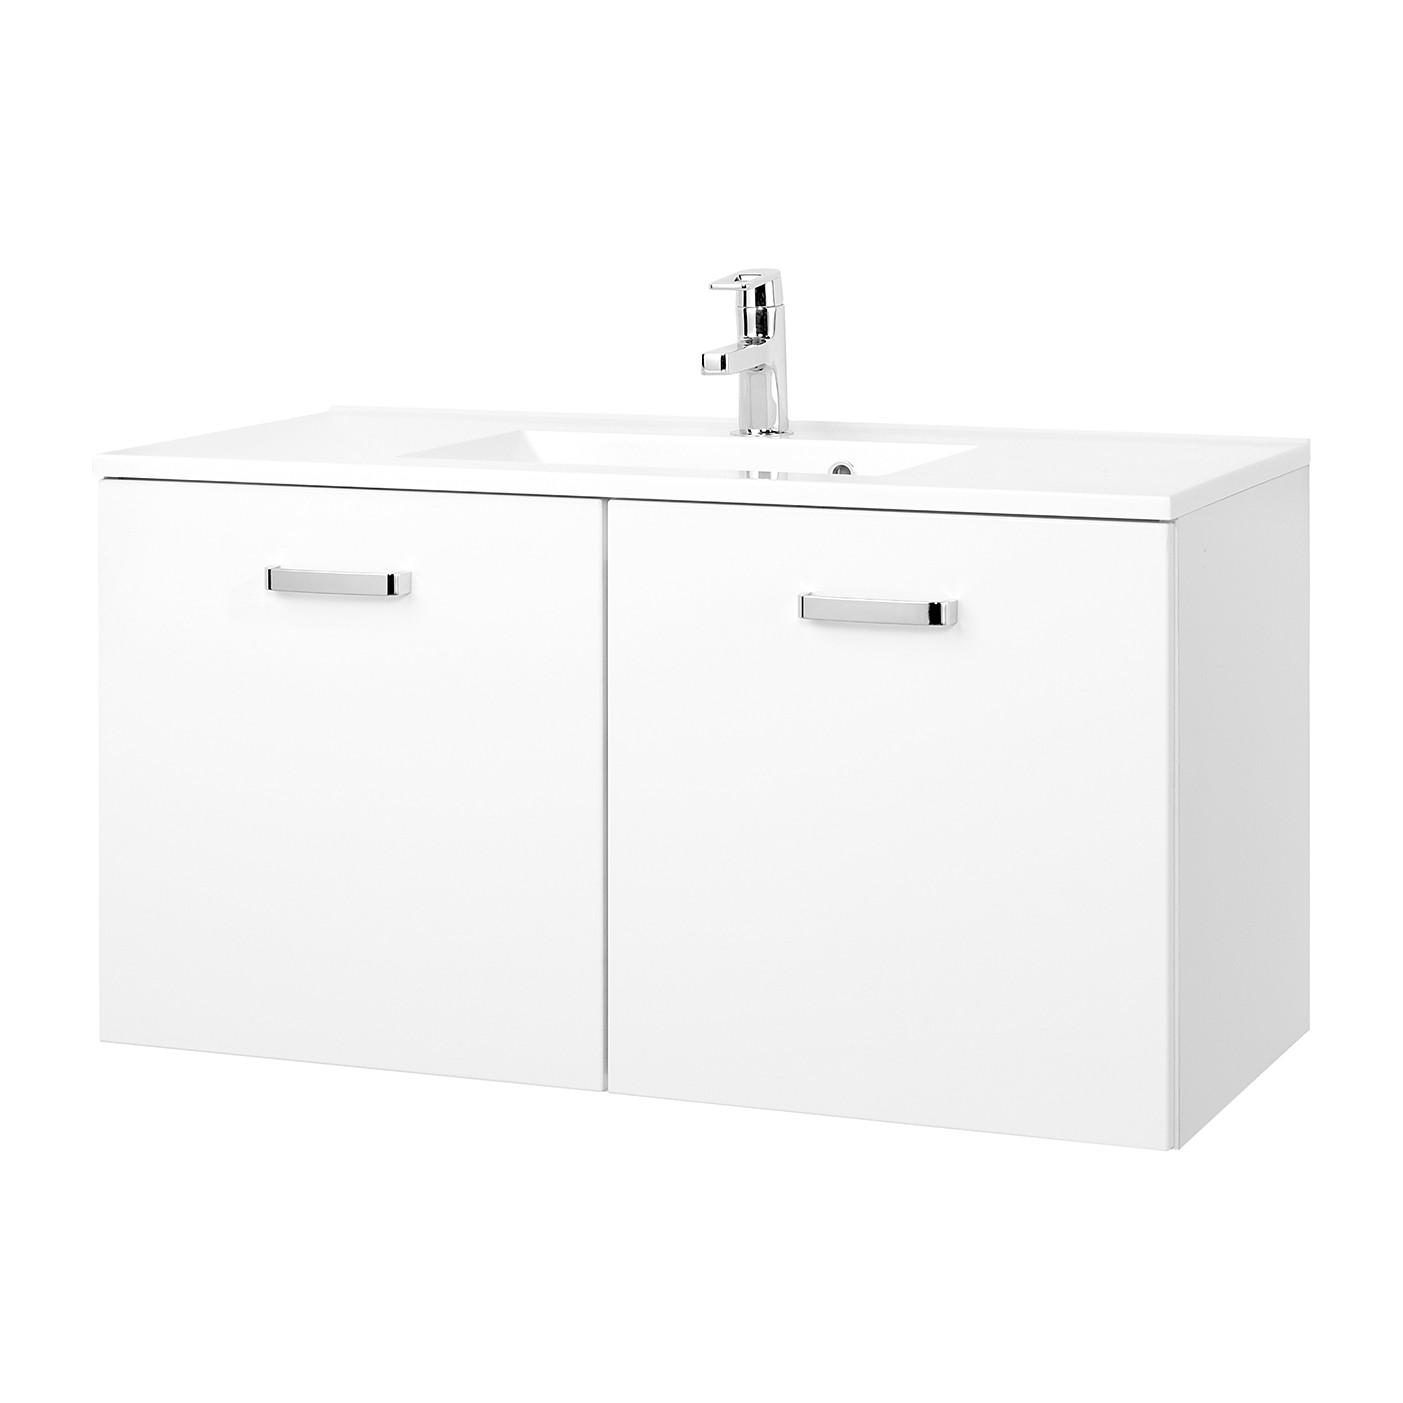 Waschtisch Zeehan - Weiß - 100 cm, Giessbach